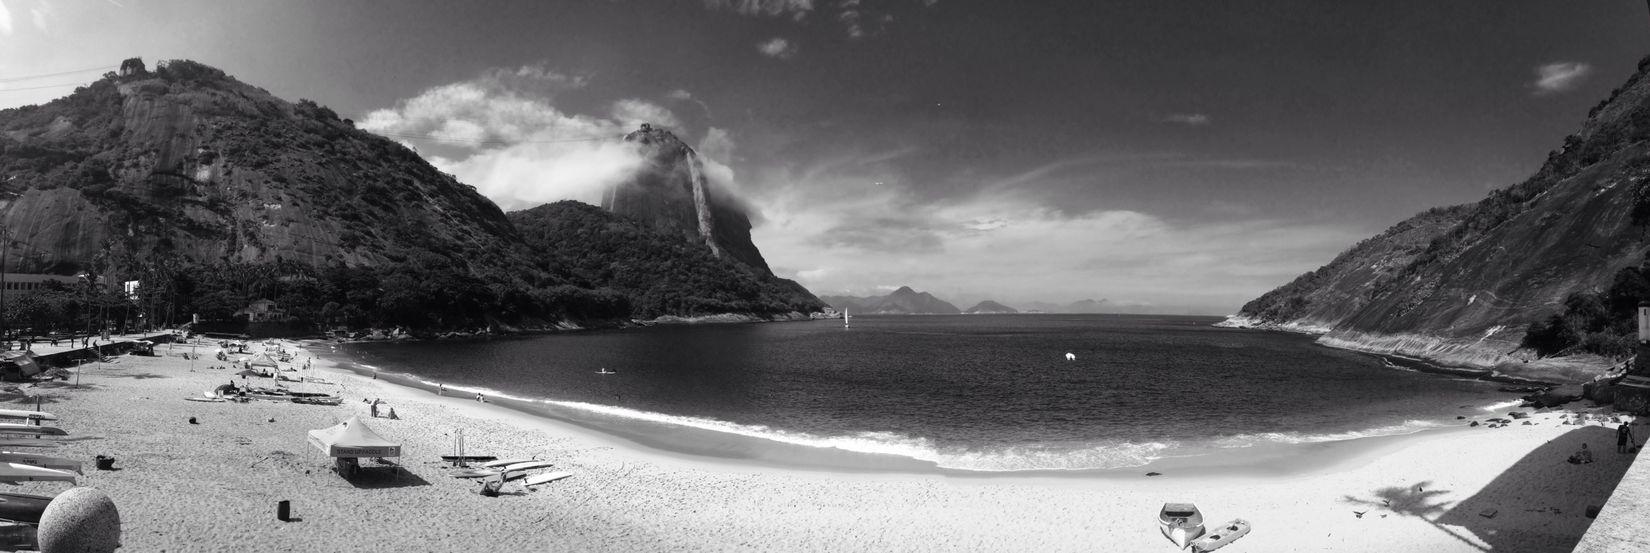 Beachphotography love